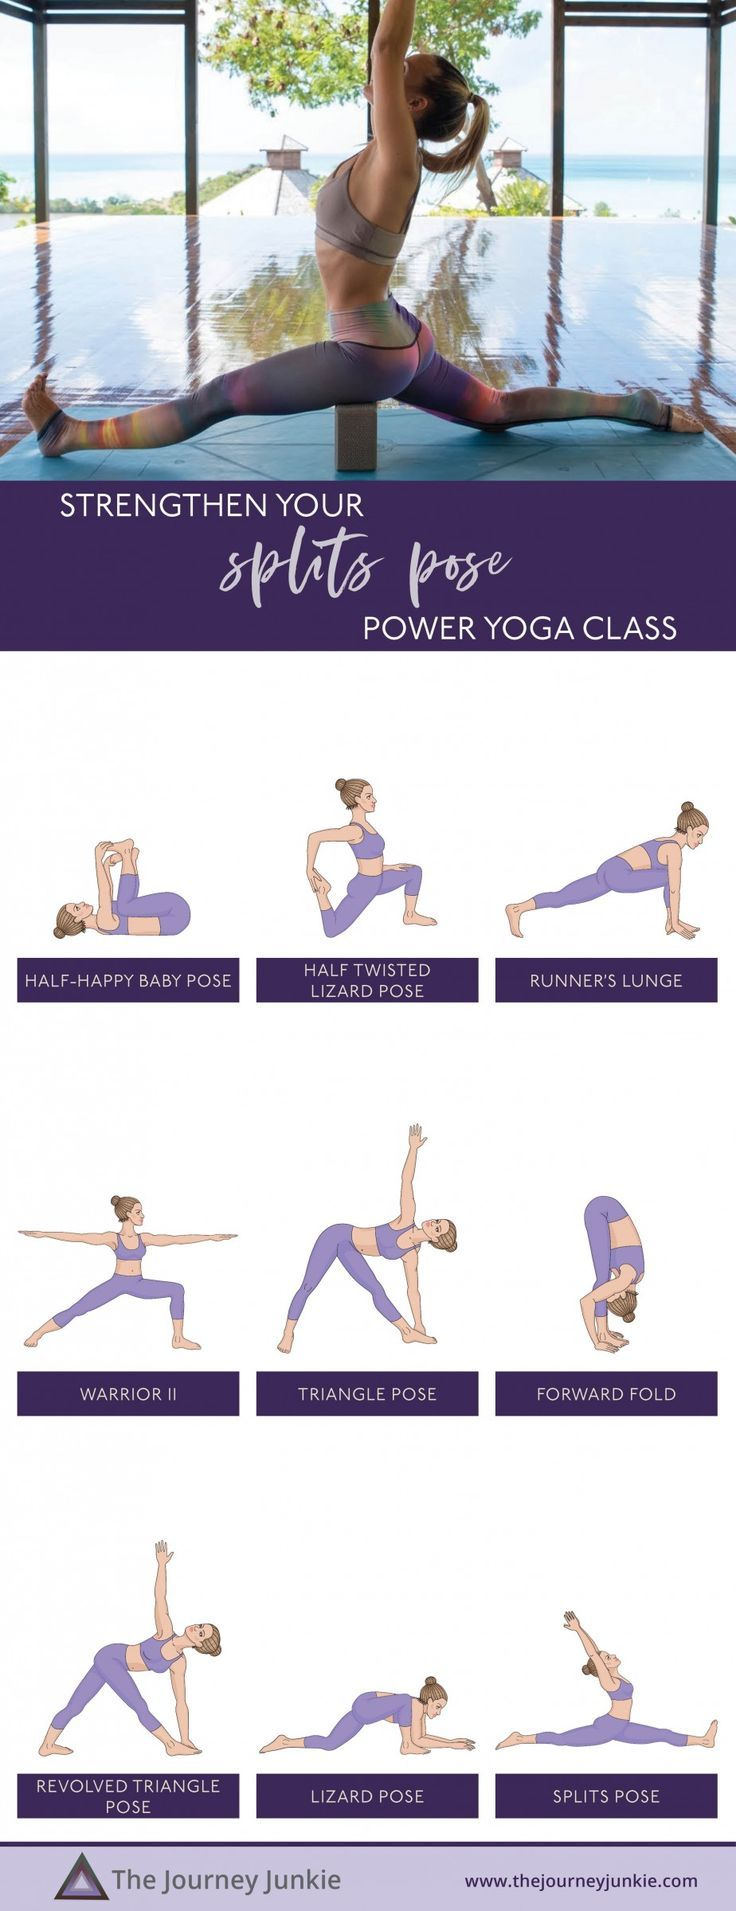 Yoga Class for Splits: Stretch + Strengthen into Hanumanasana